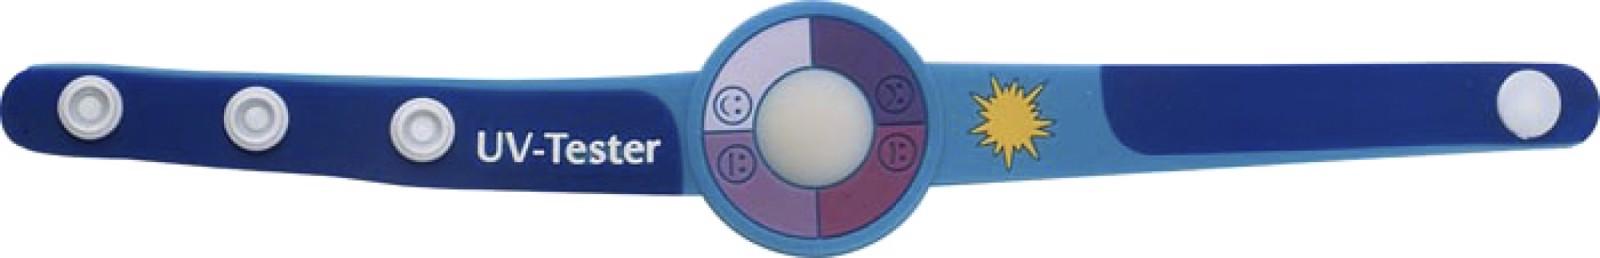 PVC UV tester wrist strap